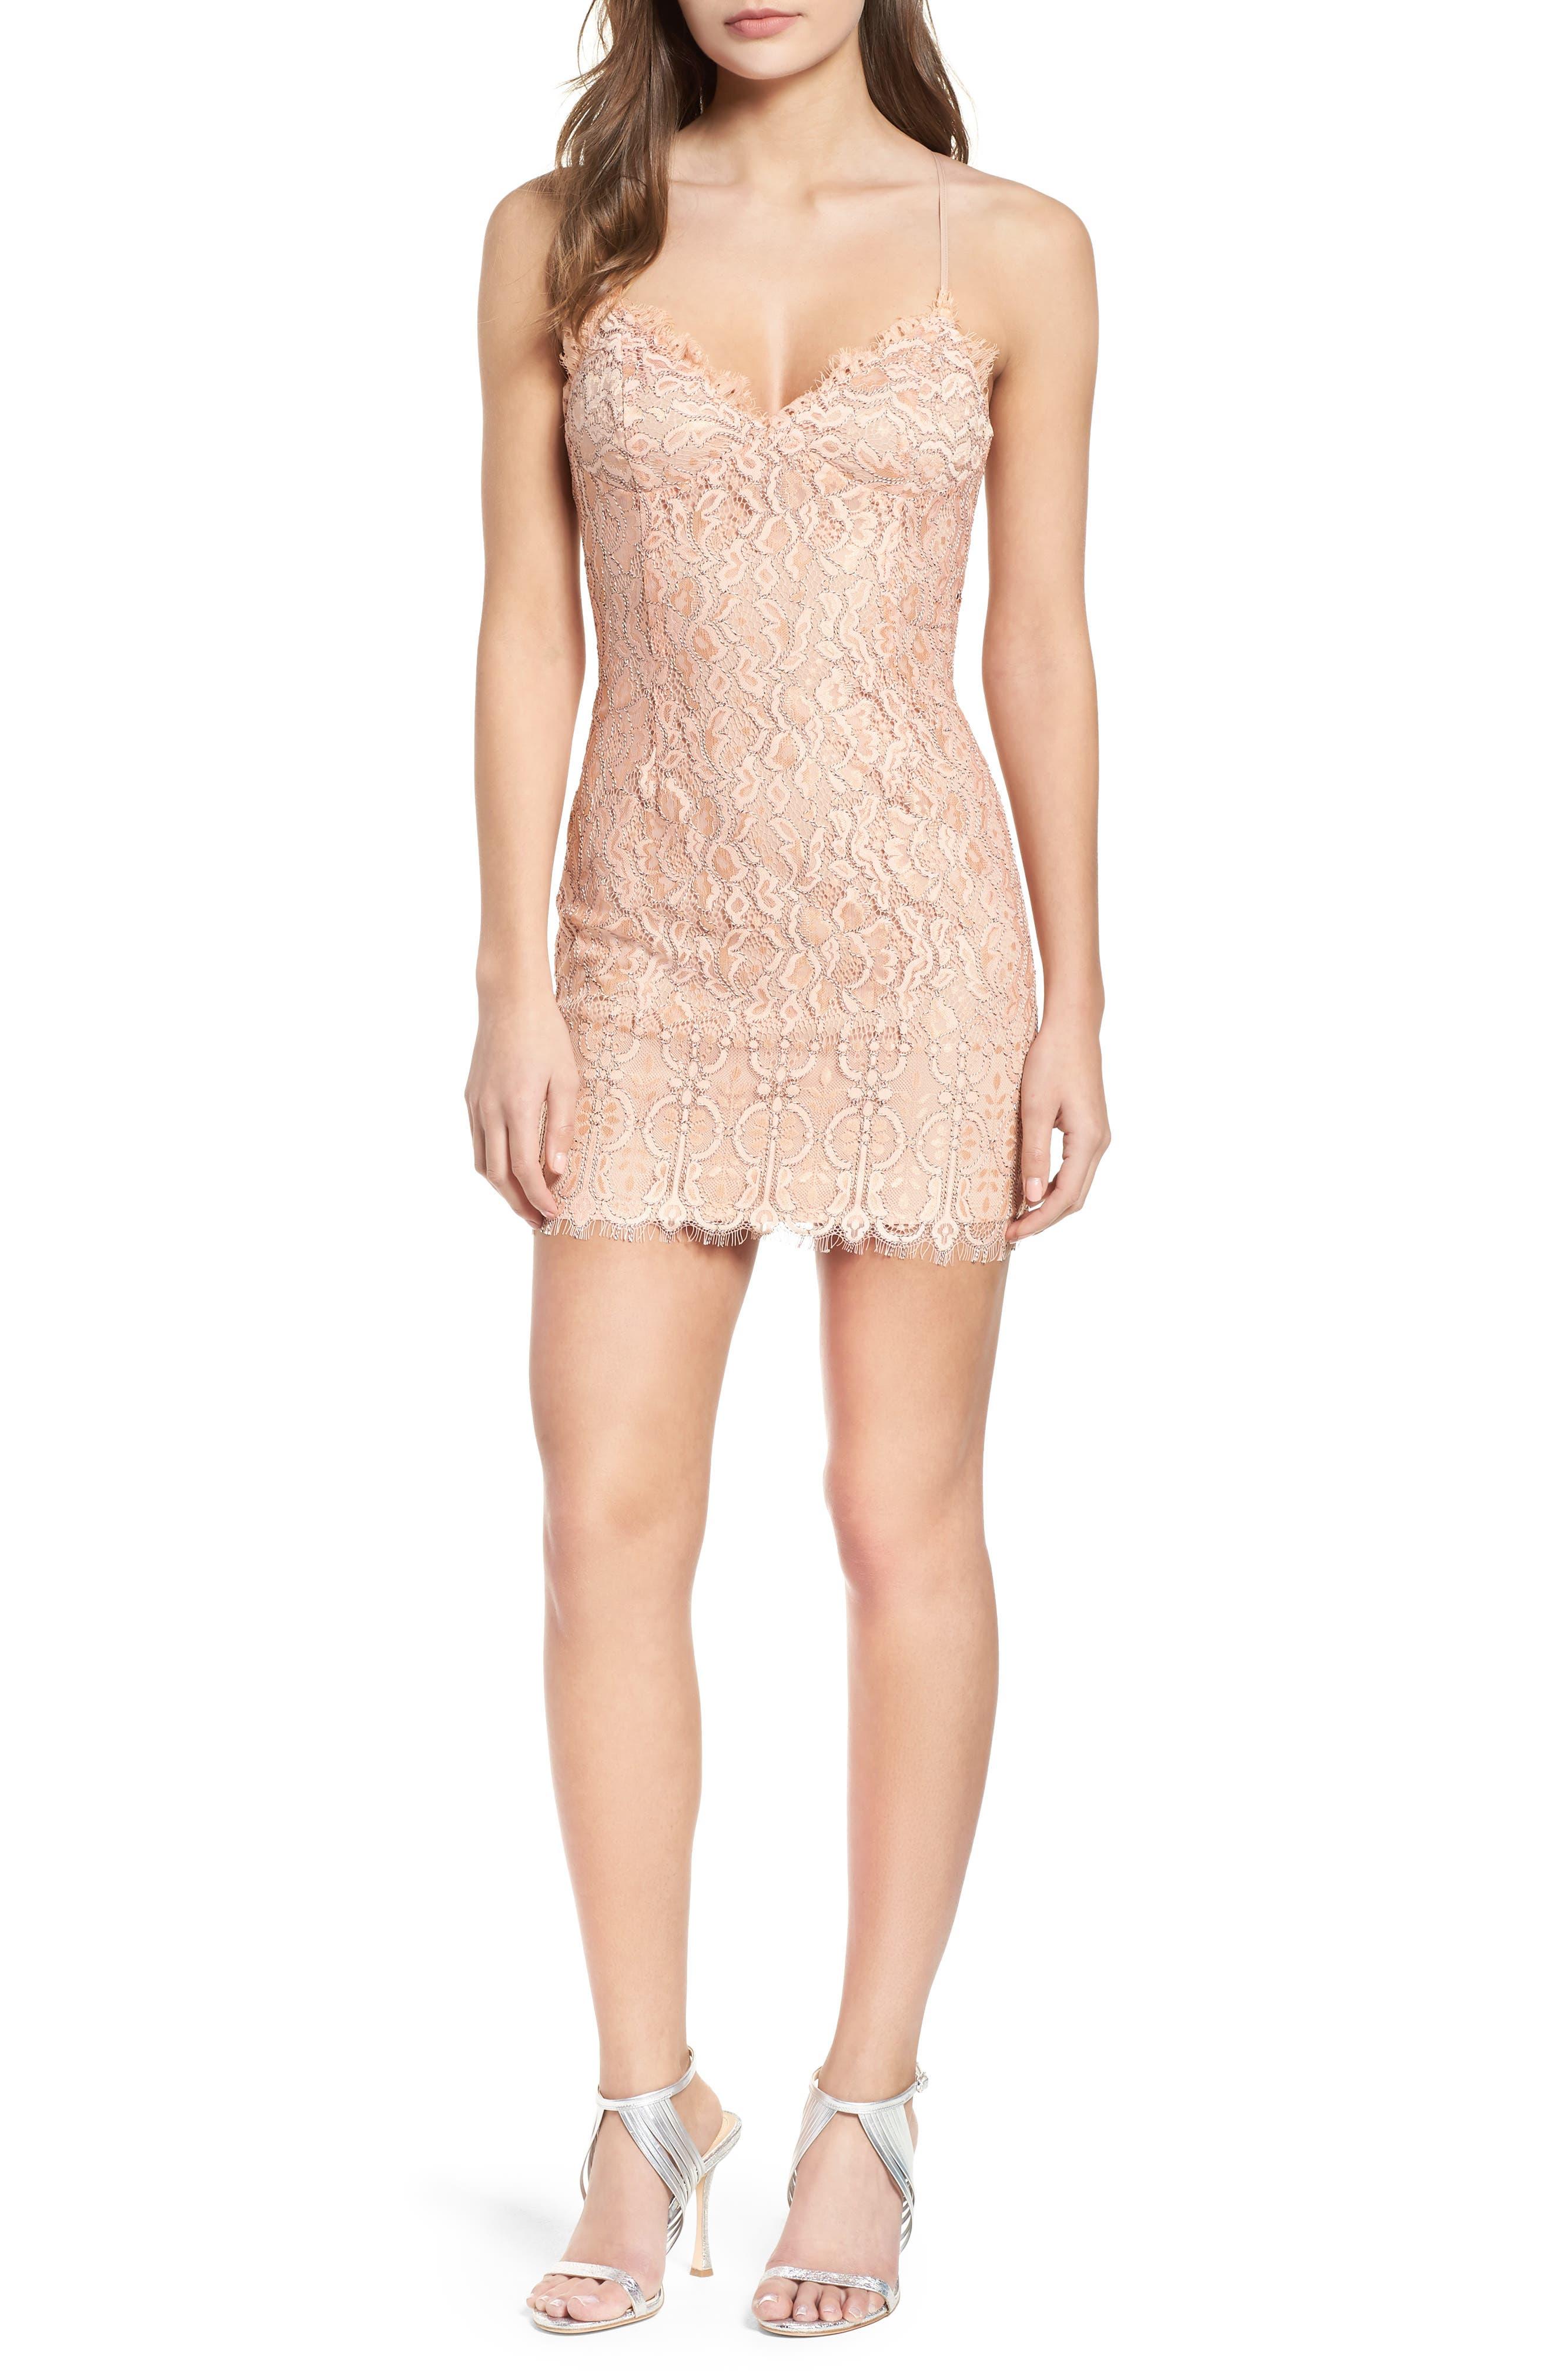 Delilah Dress in Rose. - size M (also in L,S) NBD